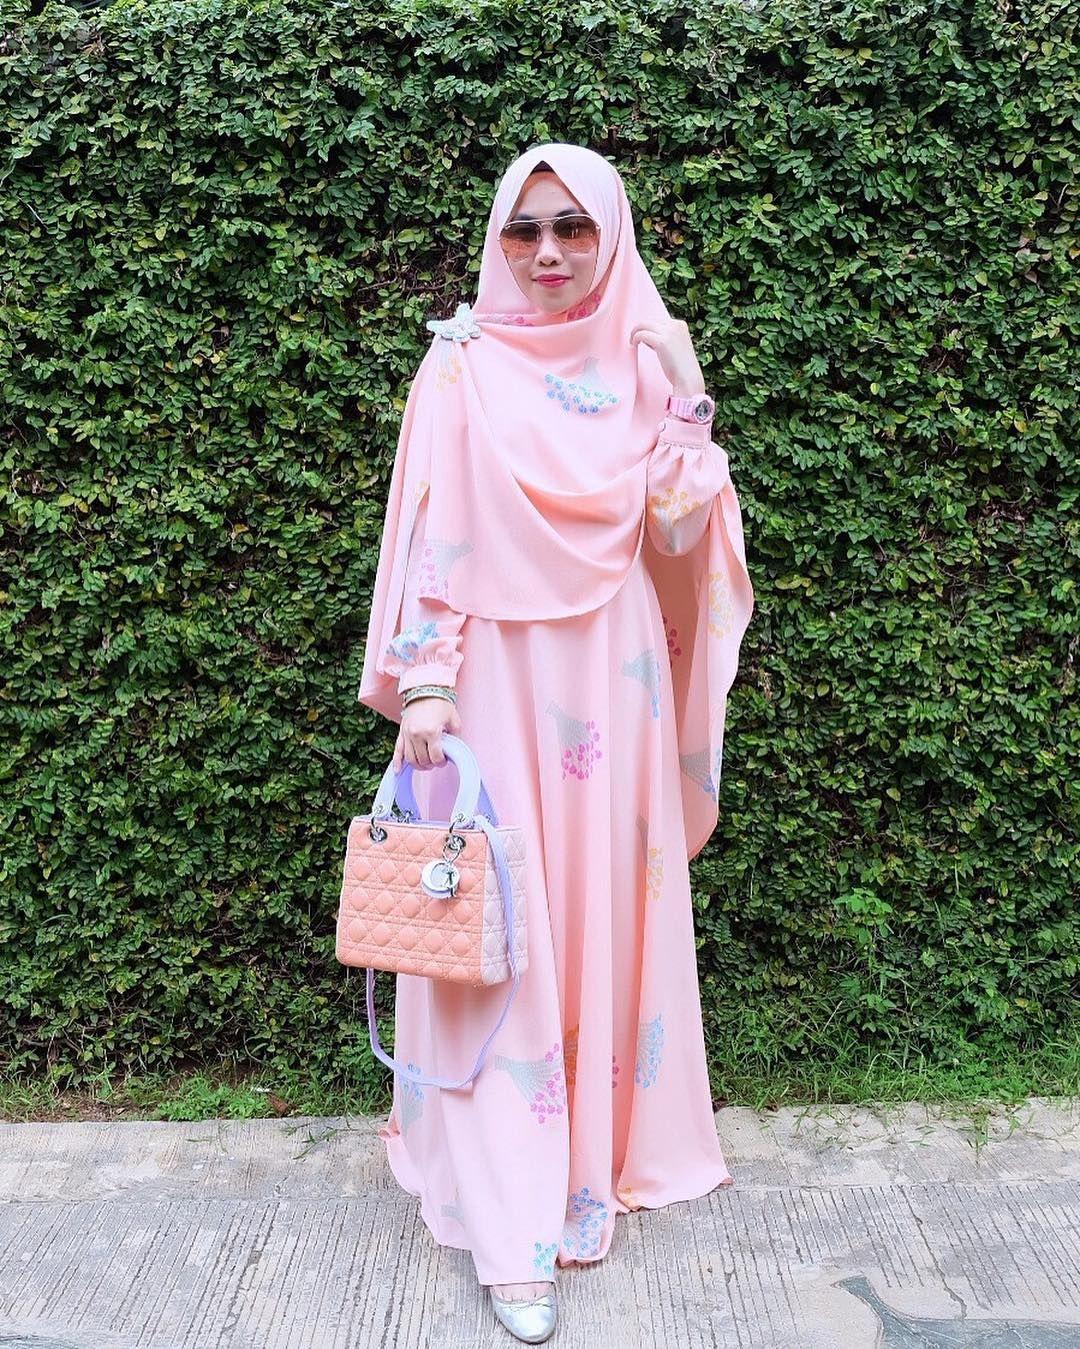 Model Baju Hijab Syari Gamis In 2018 Pinterest Jilbab 3layer Ori Terbaru Beautiful Muslim